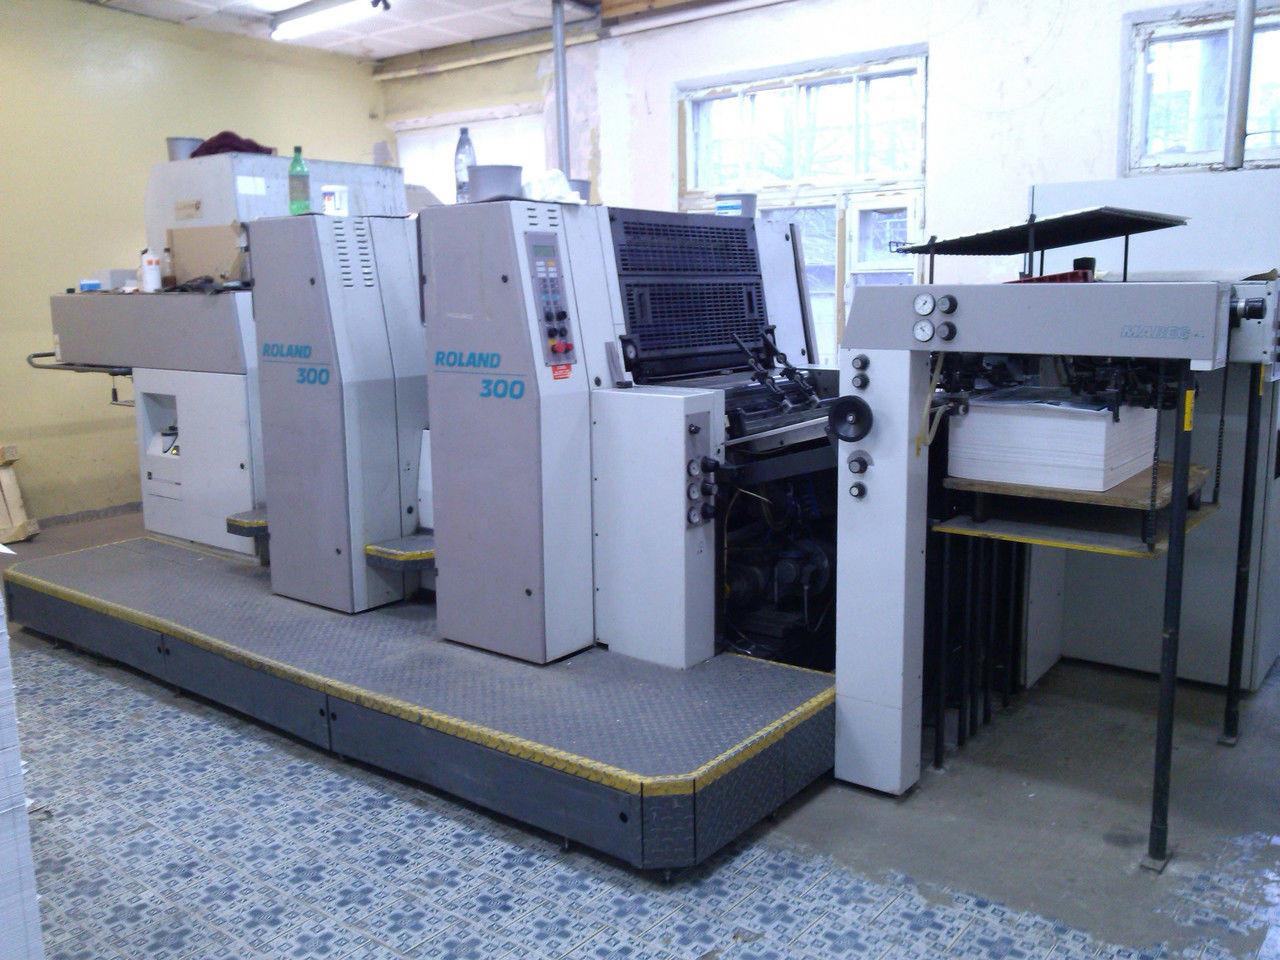 MAN Roland R 302 HOB бу 1996 г. 2-х красочная листовая офсетная печатная машина